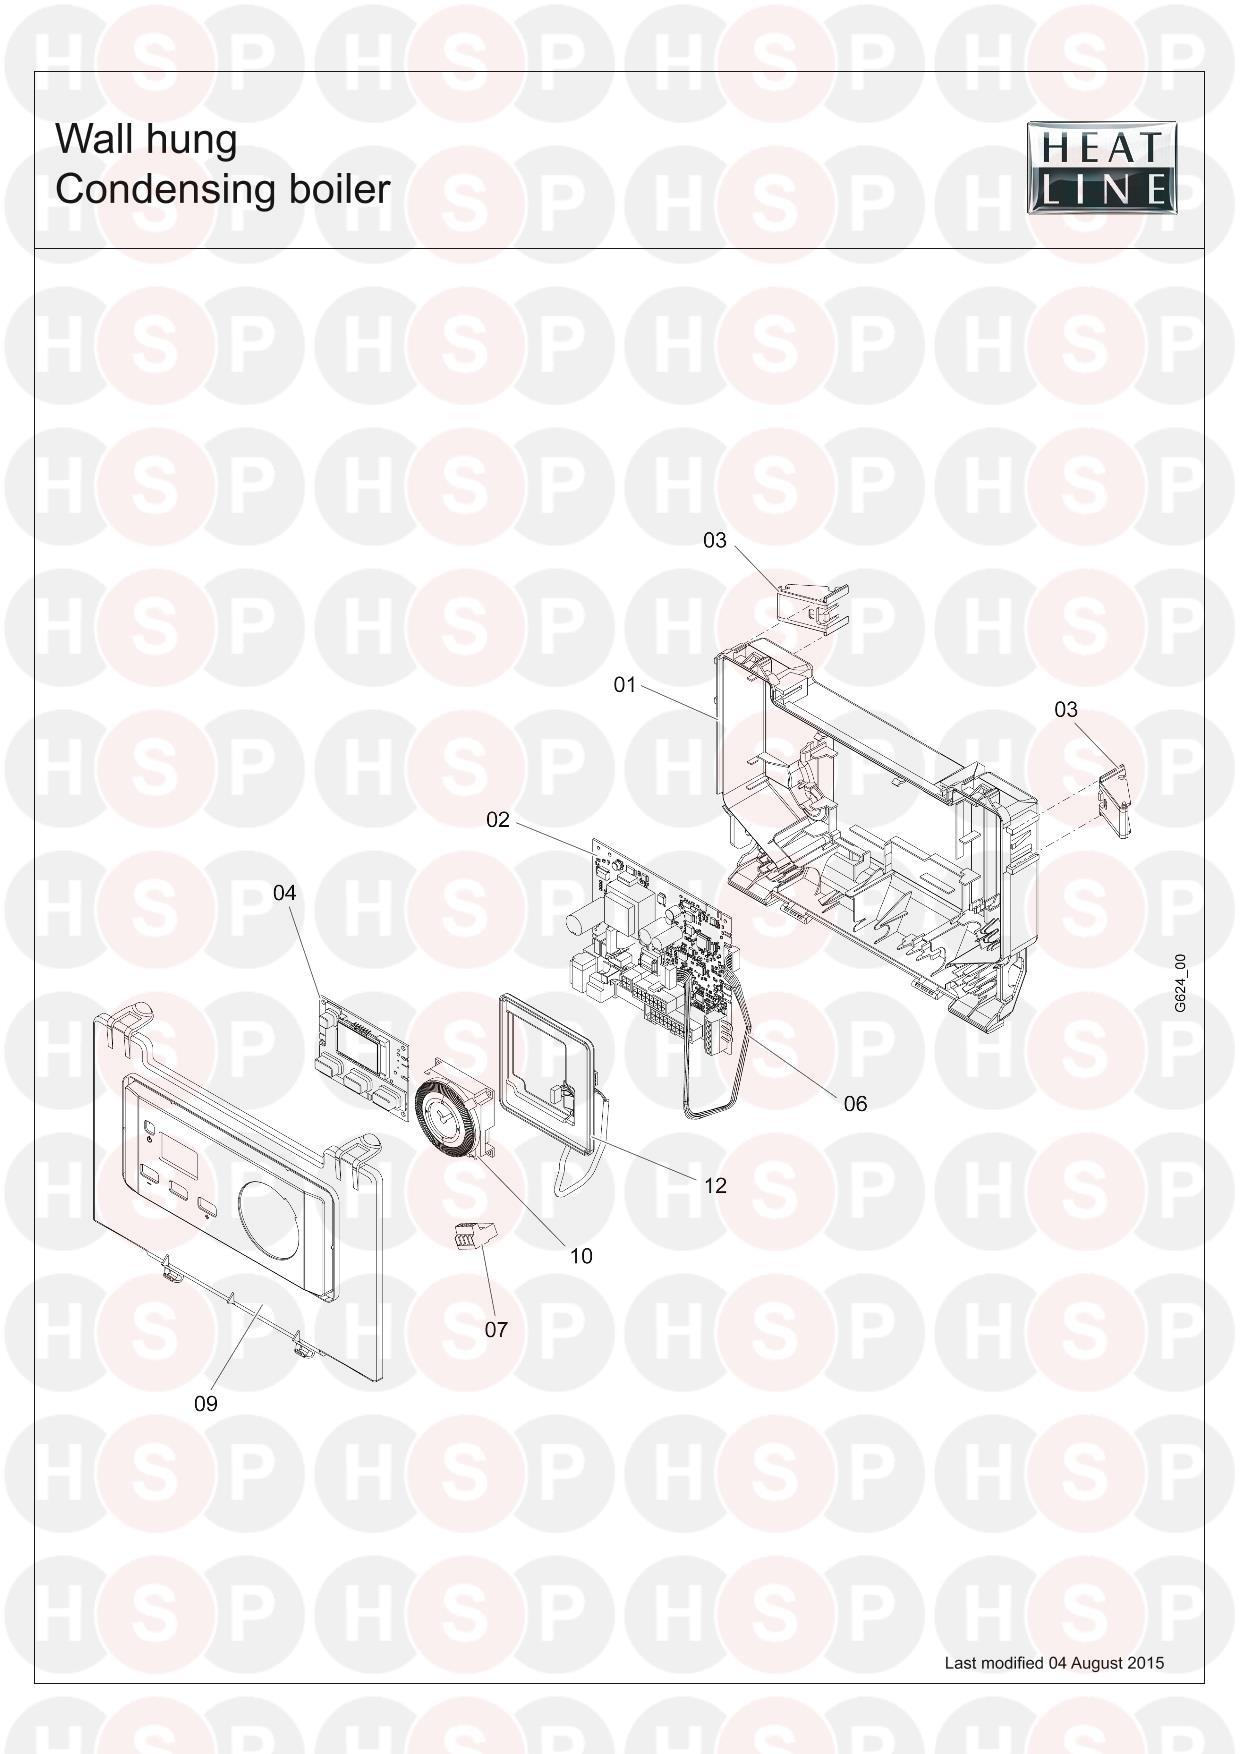 Heatline Capriz 2 28c 2015 Onwards  06 Electronics Diagram